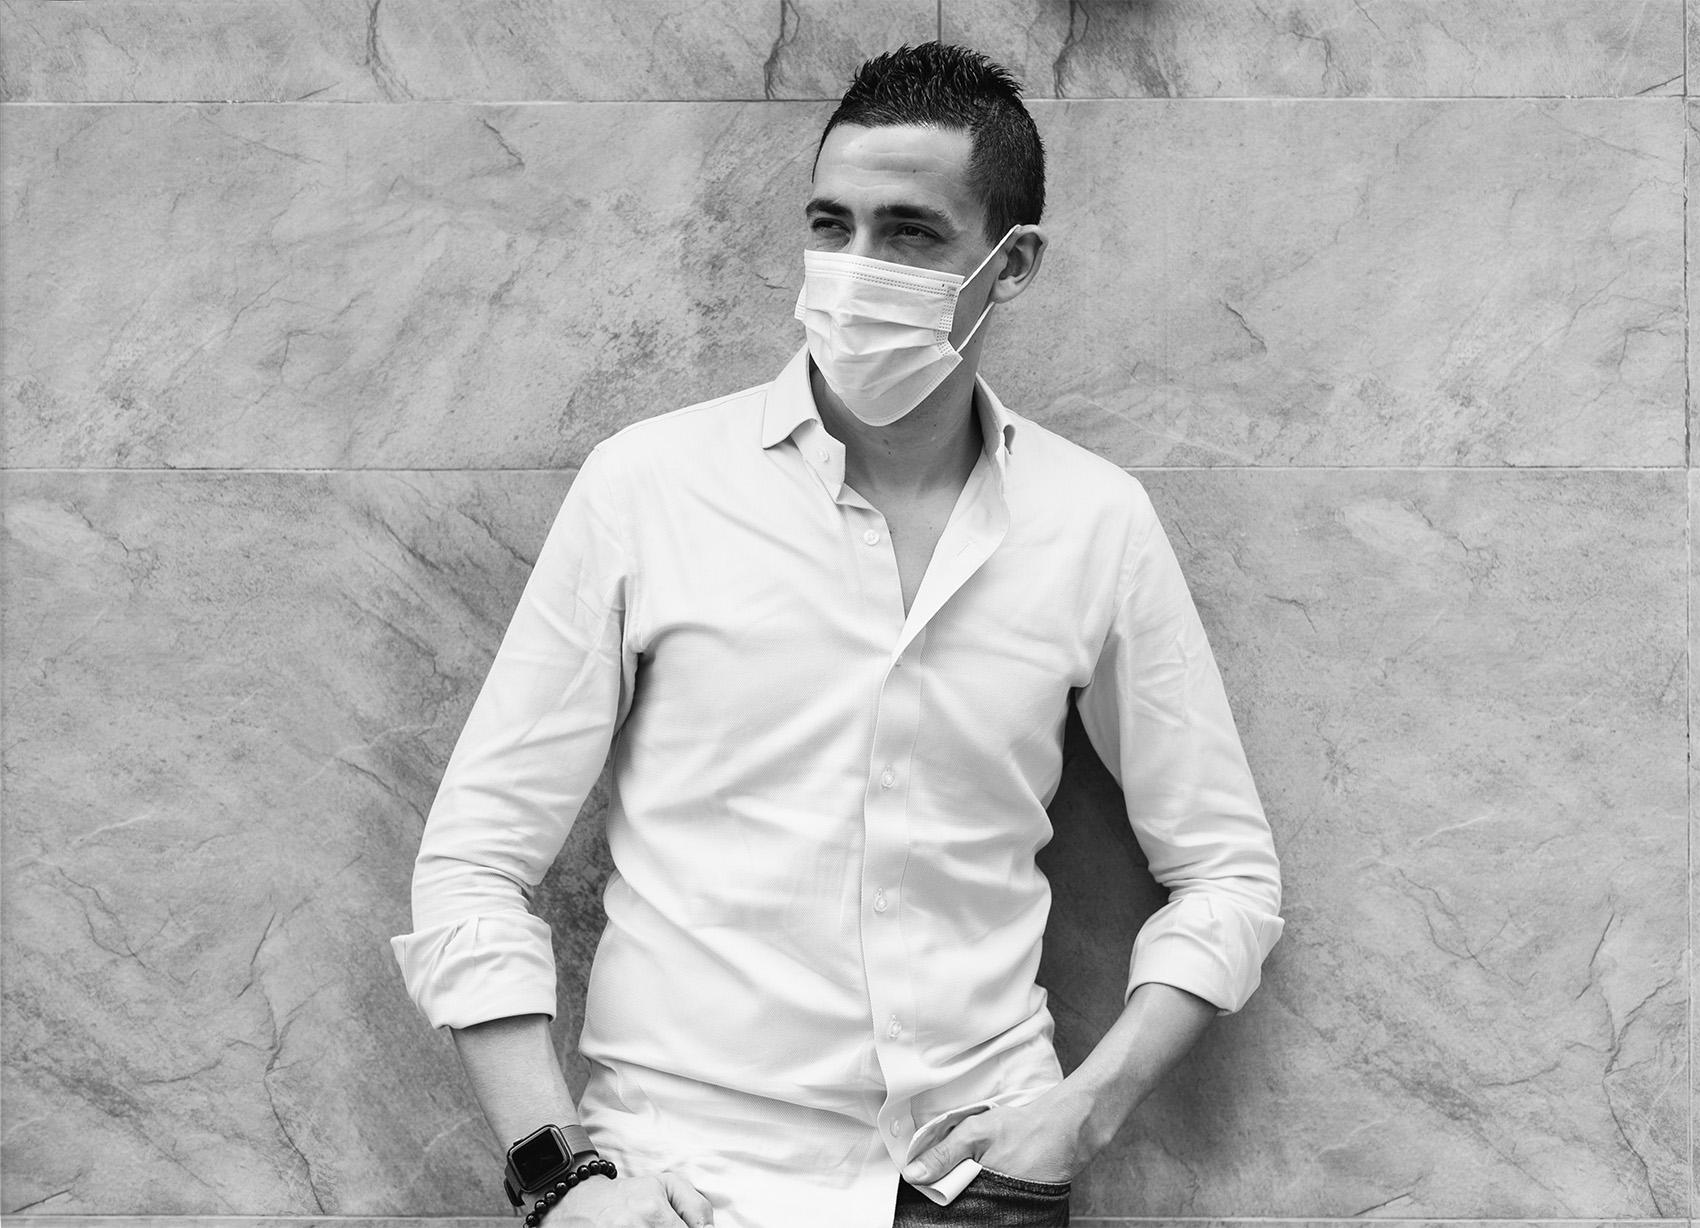 People of the pandemic Manuel palacio